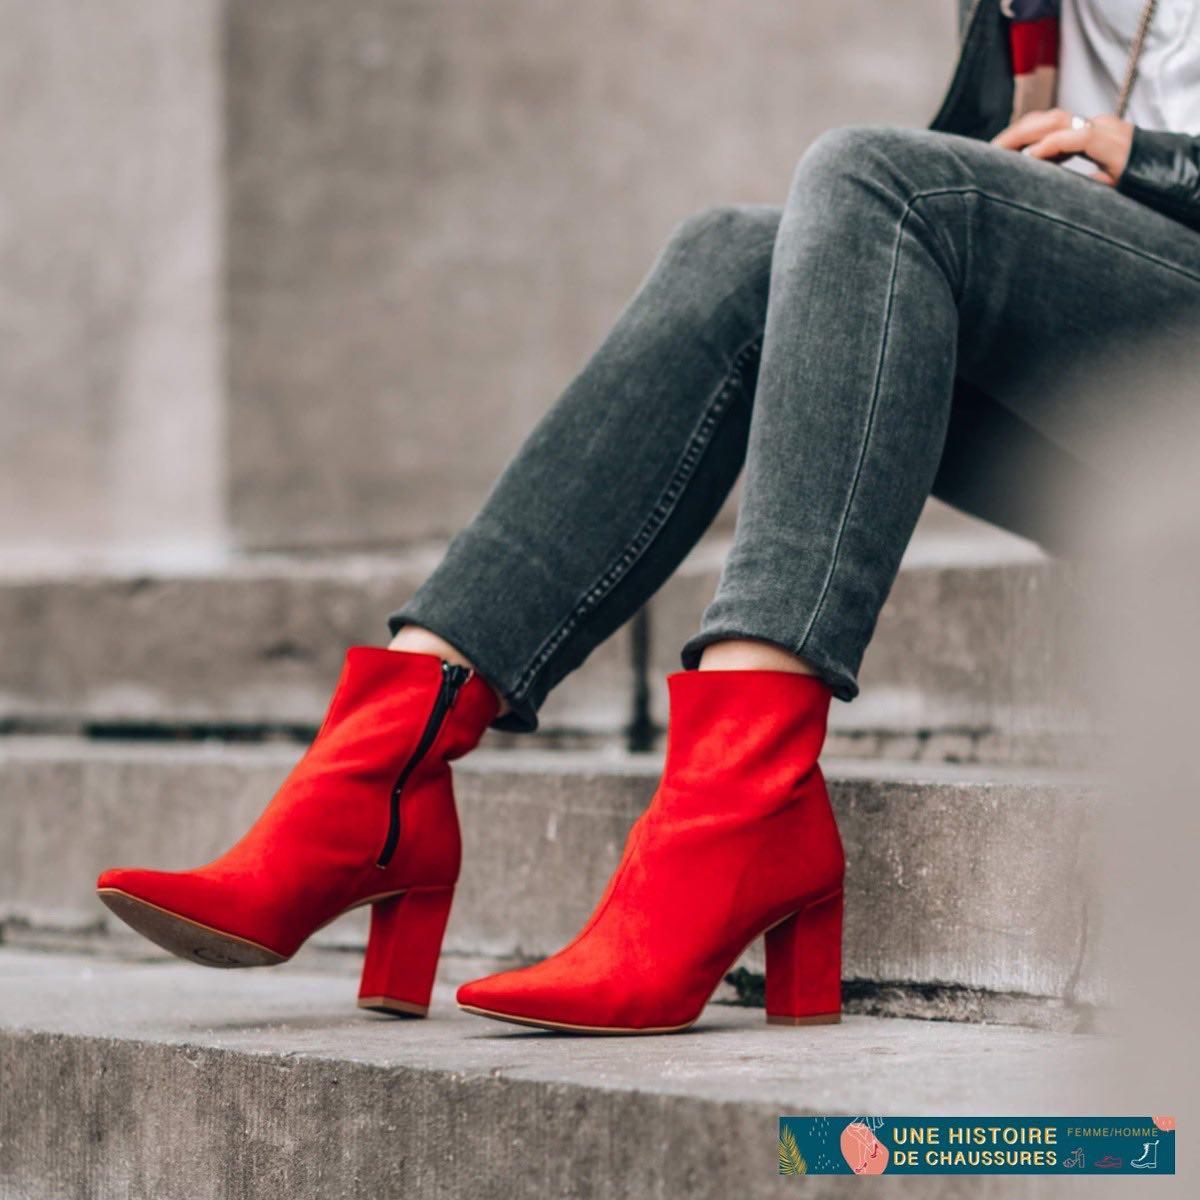 https://cdt44.media.tourinsoft.eu/upload/une-histoire-de-chaussures.jpg